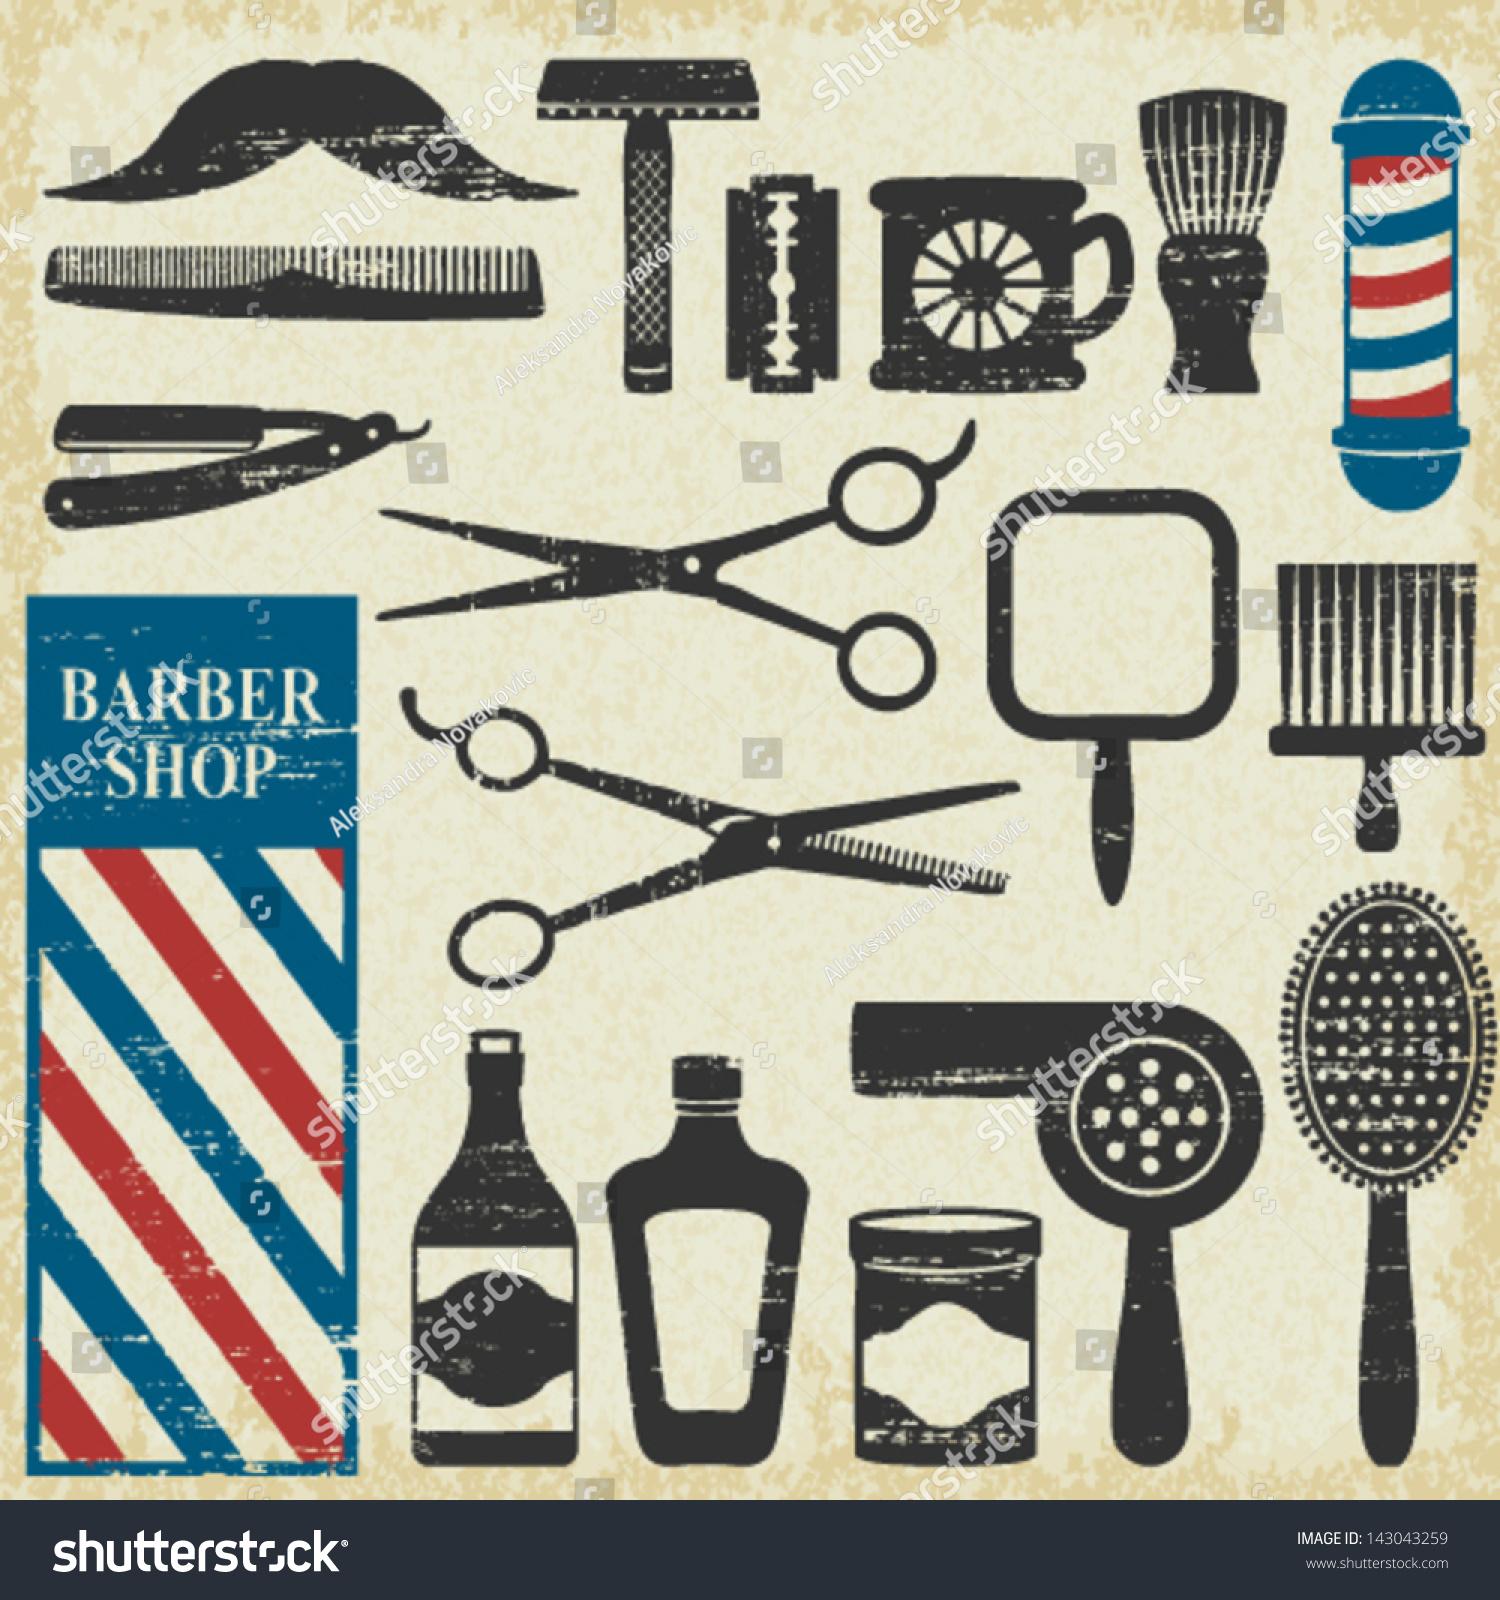 Antique barber shop signs - Vintage Barber Shop Tools Silhouette Icons Set 1 143043259